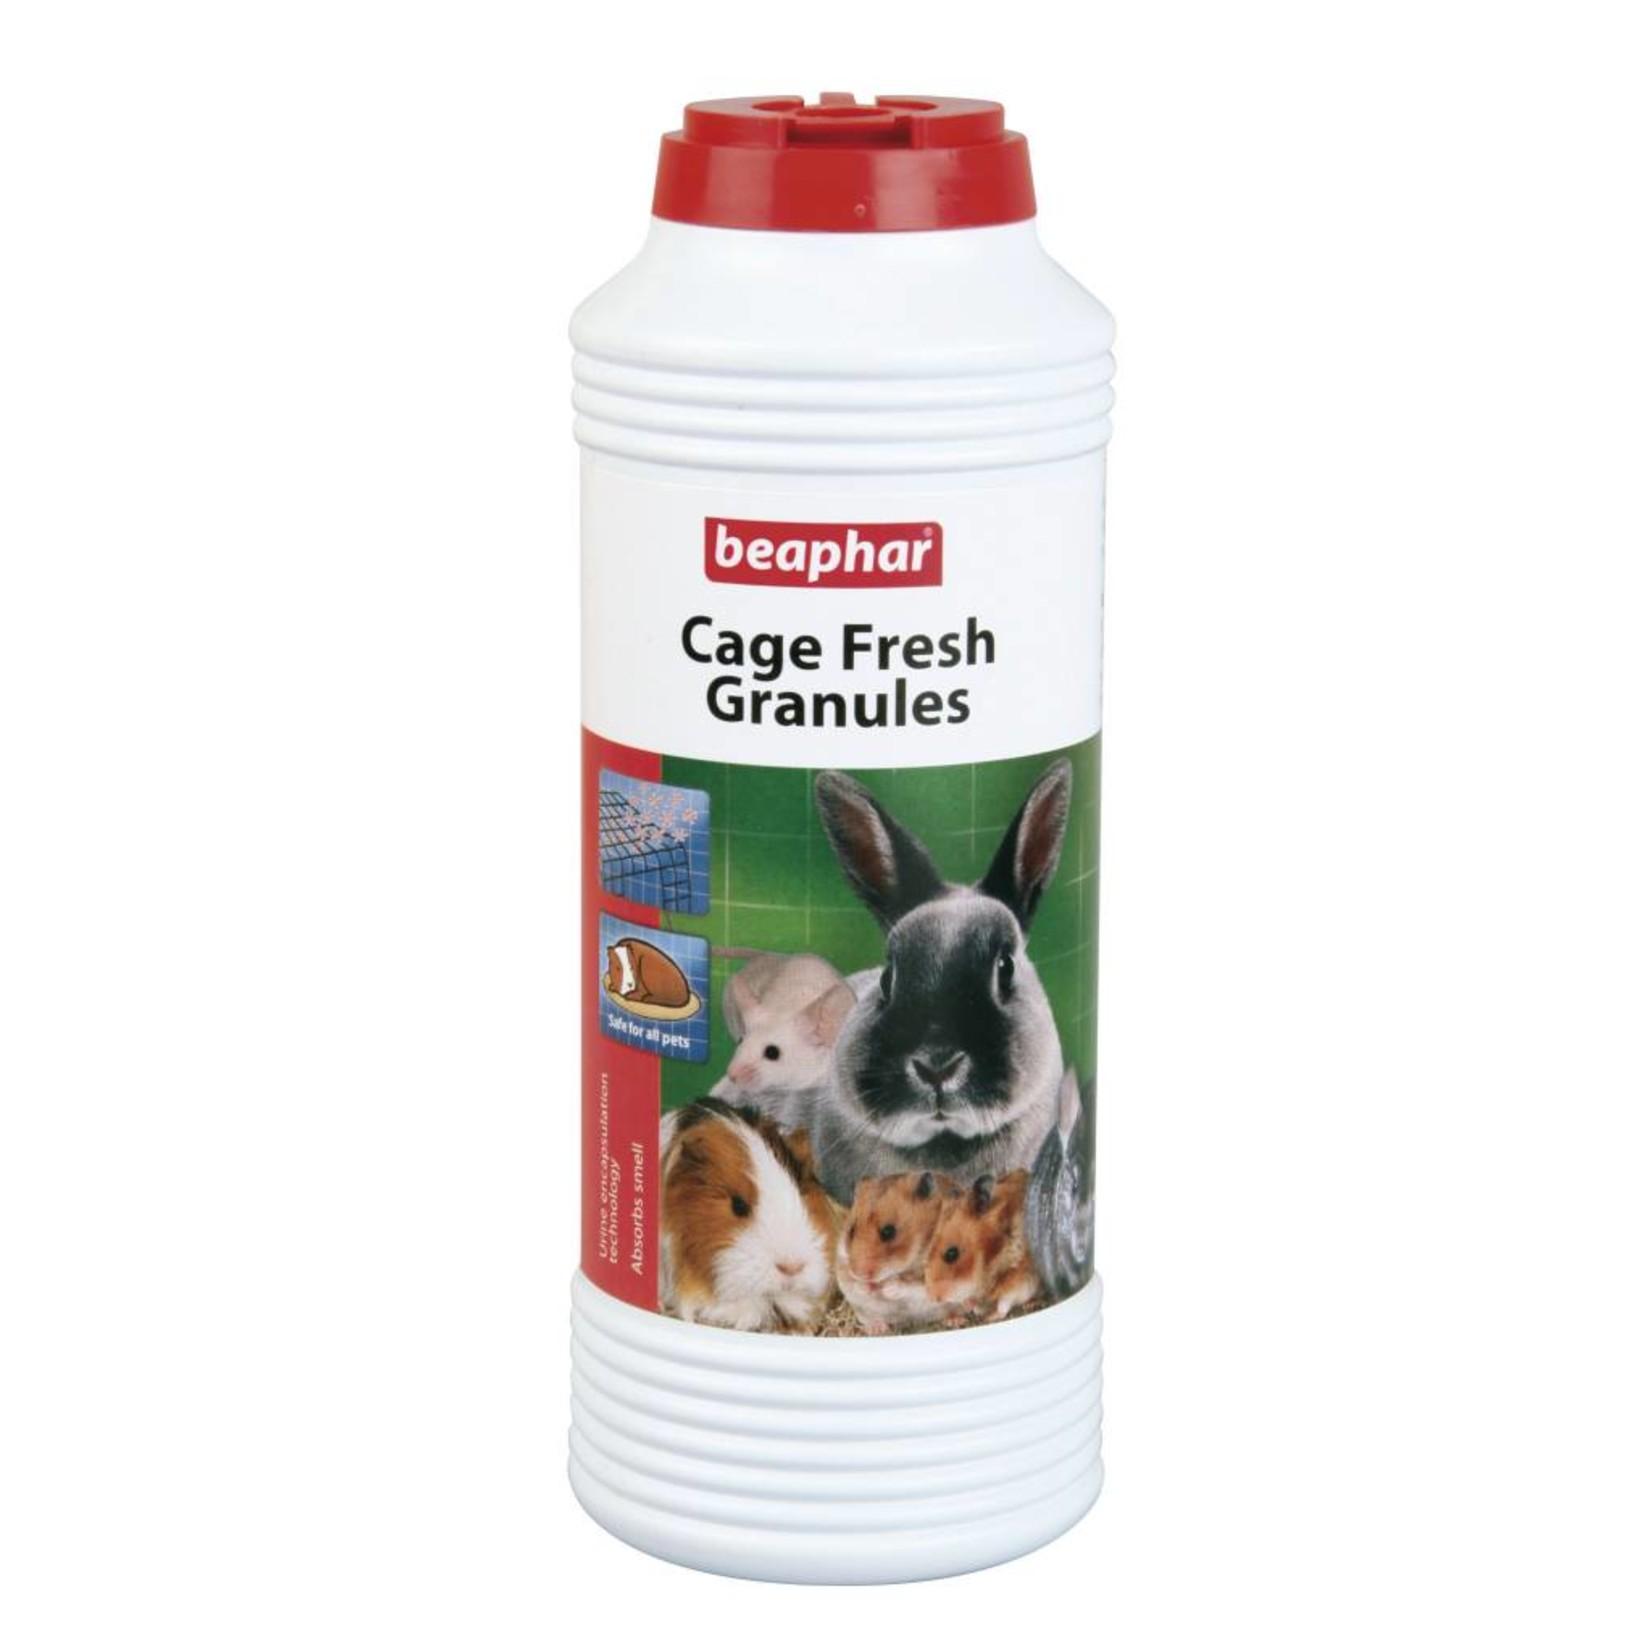 Beaphar Cage Fresh Granules for Small Animals, 600g